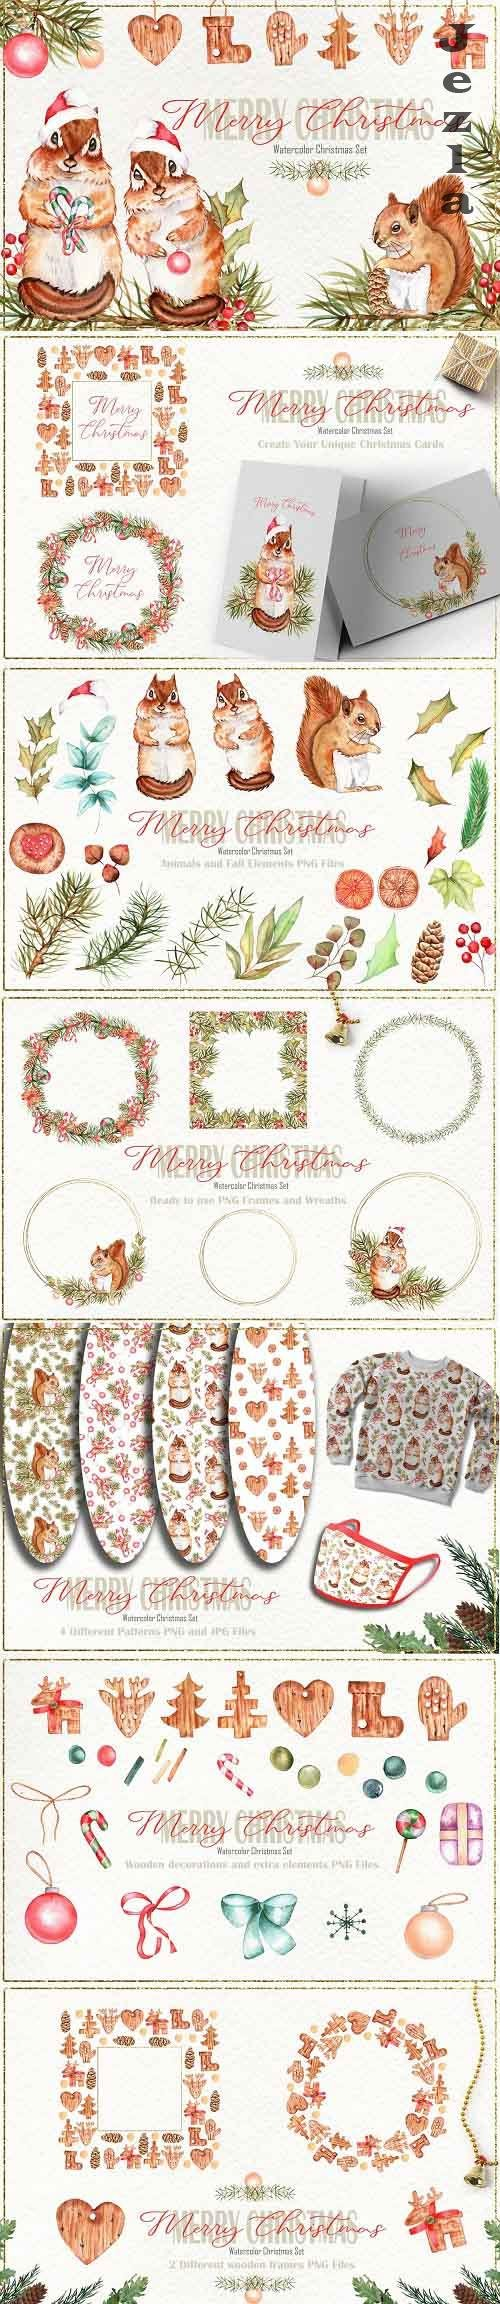 Merry Christmas Watercolor Set - 5436836